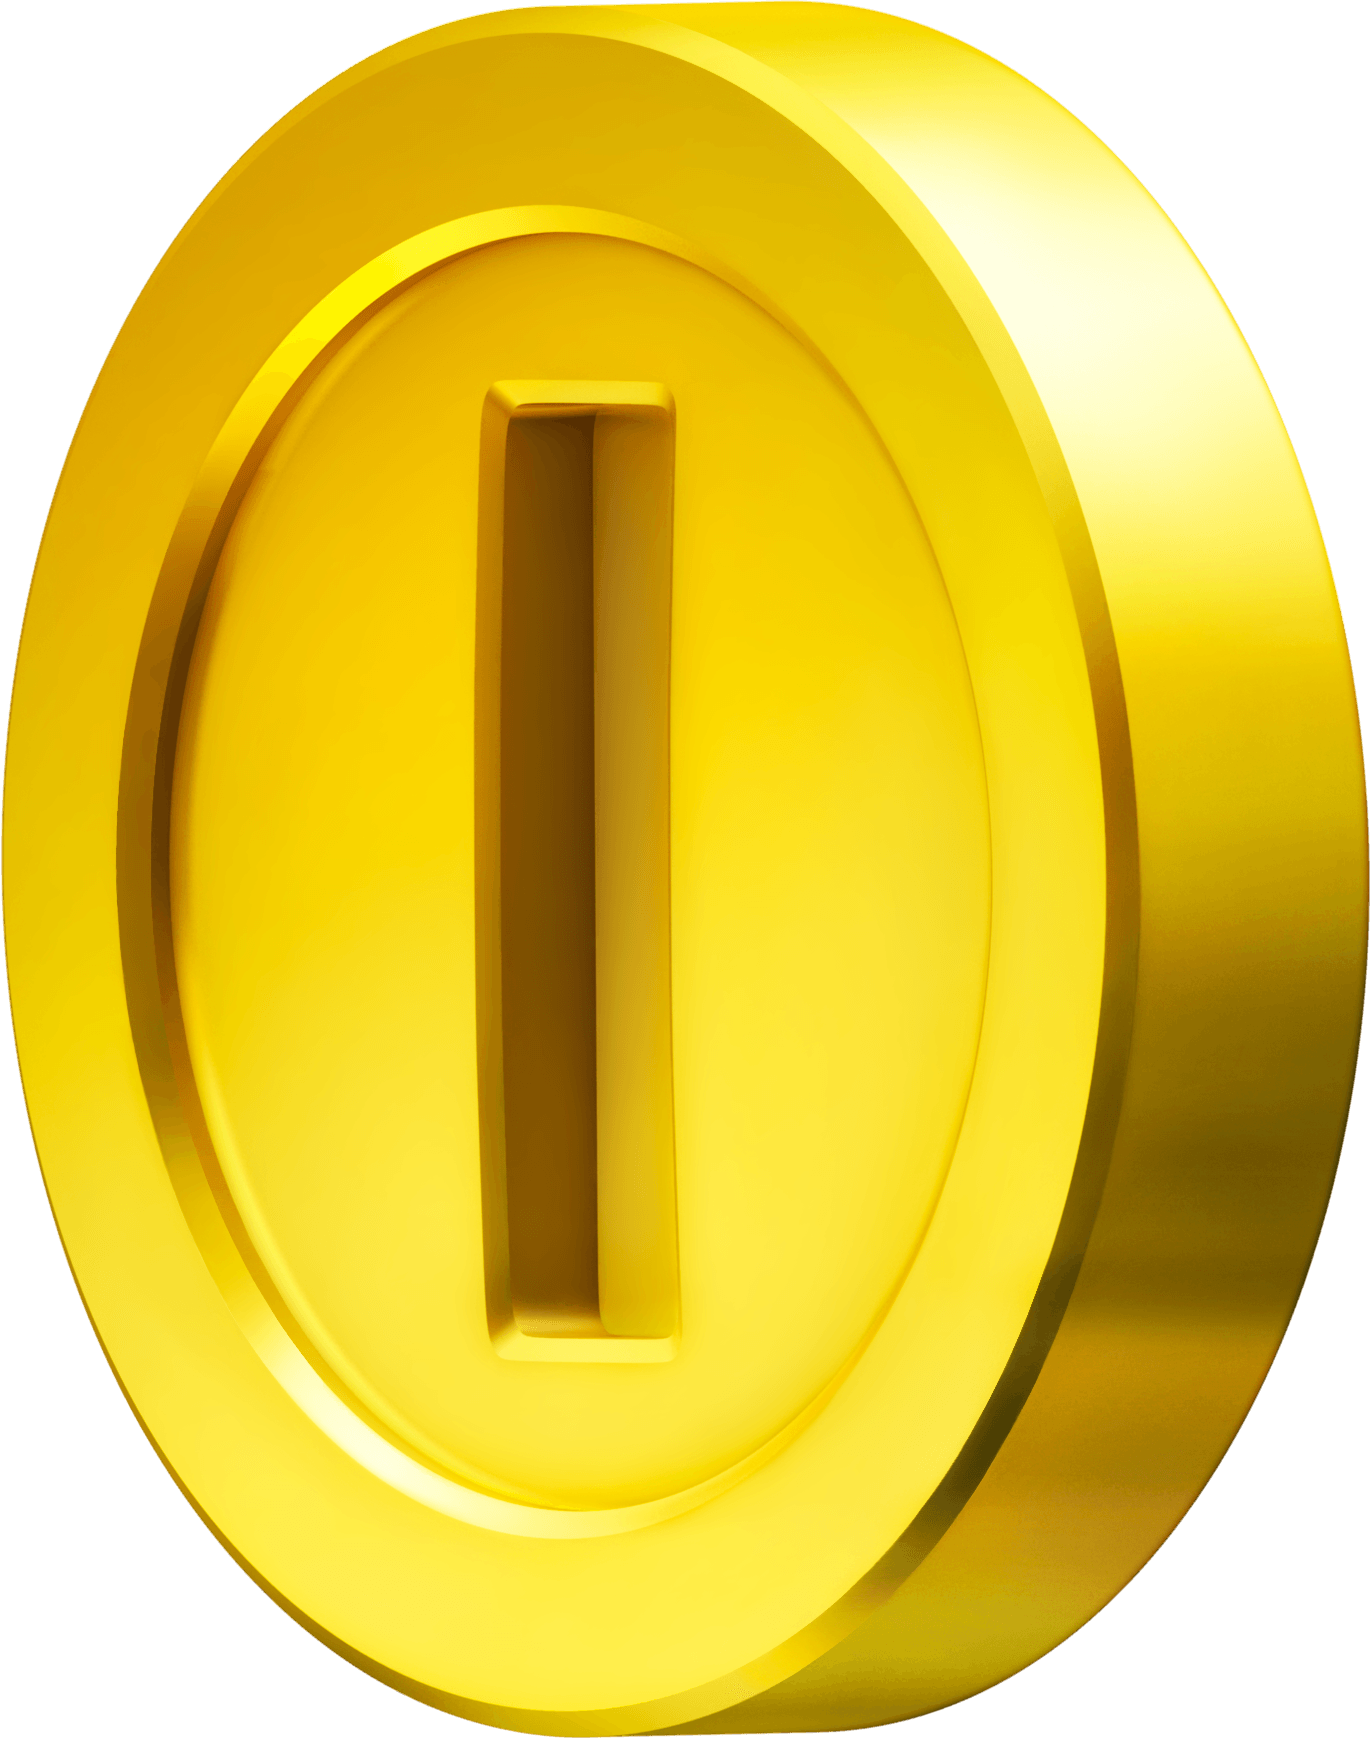 Super mario bros star coin 7-2 - Basic attention token